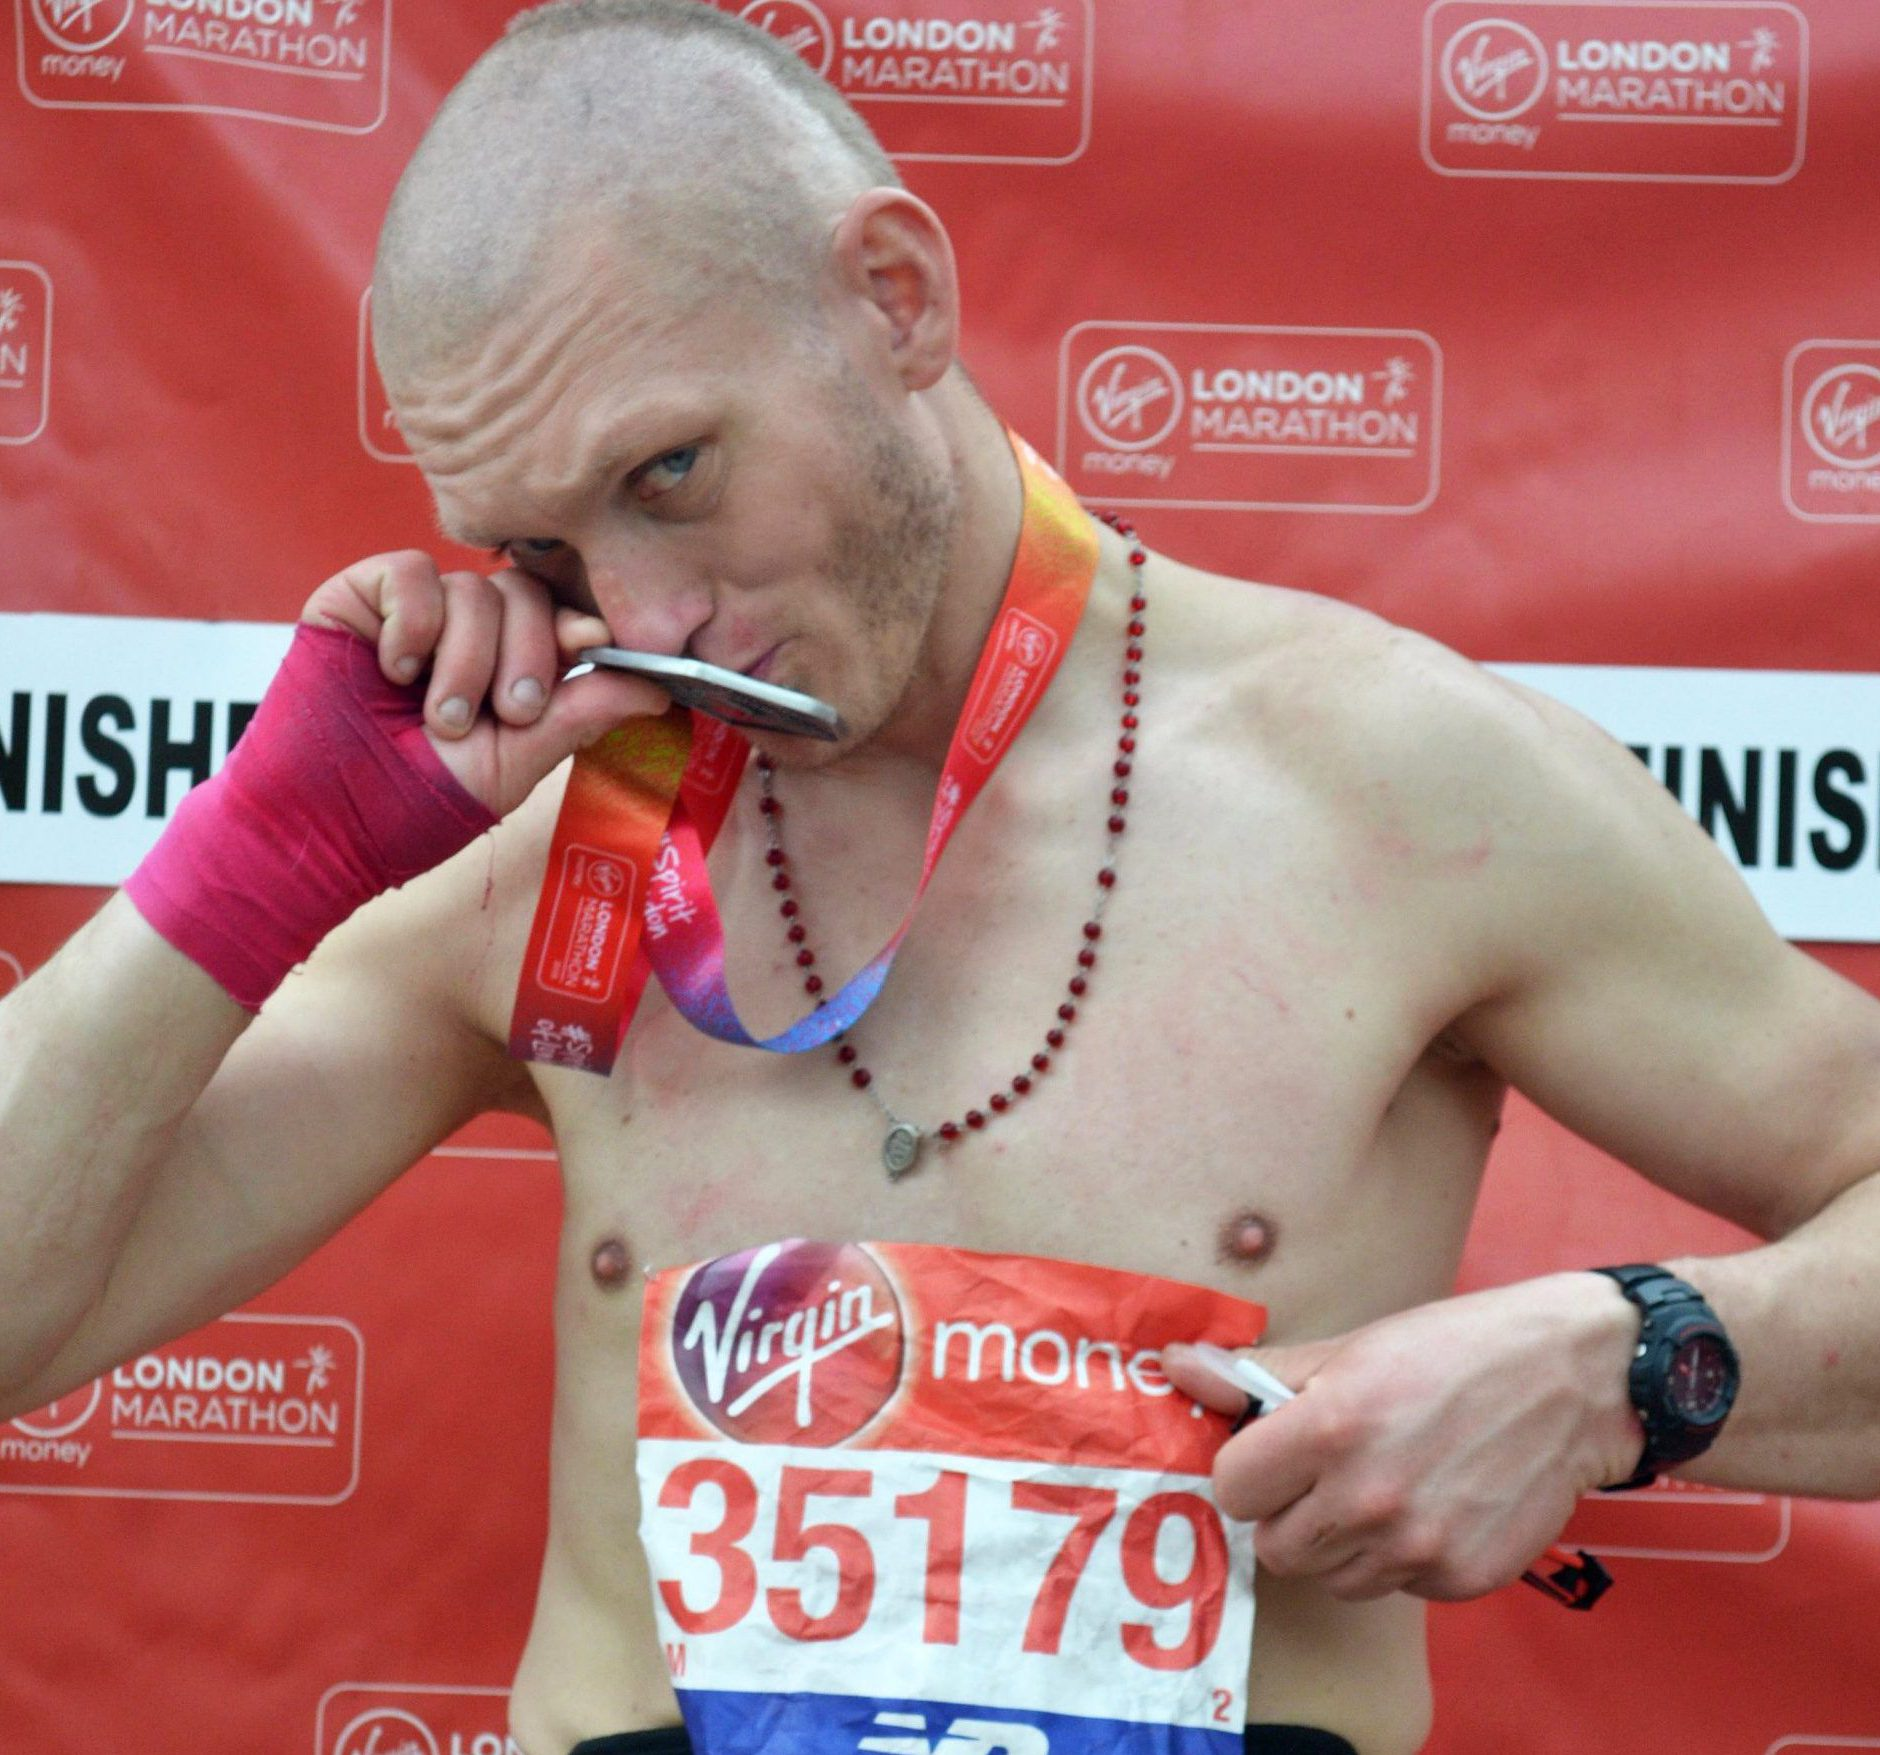 Hunt for London Marathon spectator who found lost runner's number and claimed medal METRO GRAB taken from: www.marathonfoto???.com Credit: Marathonfoto